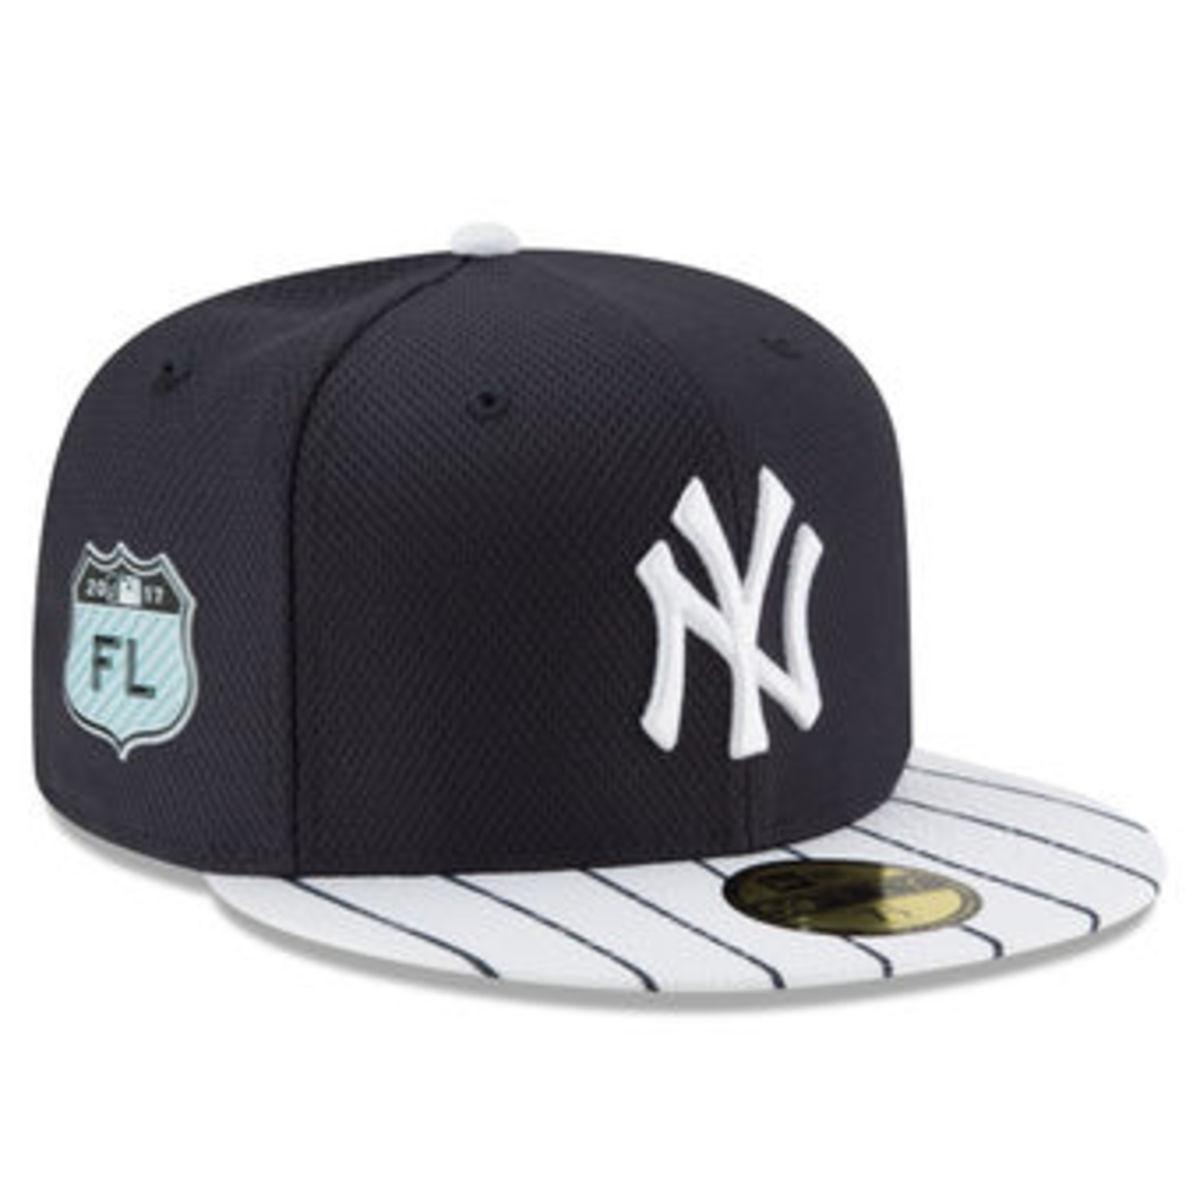 yankees-spring-training-hat-2.jpg